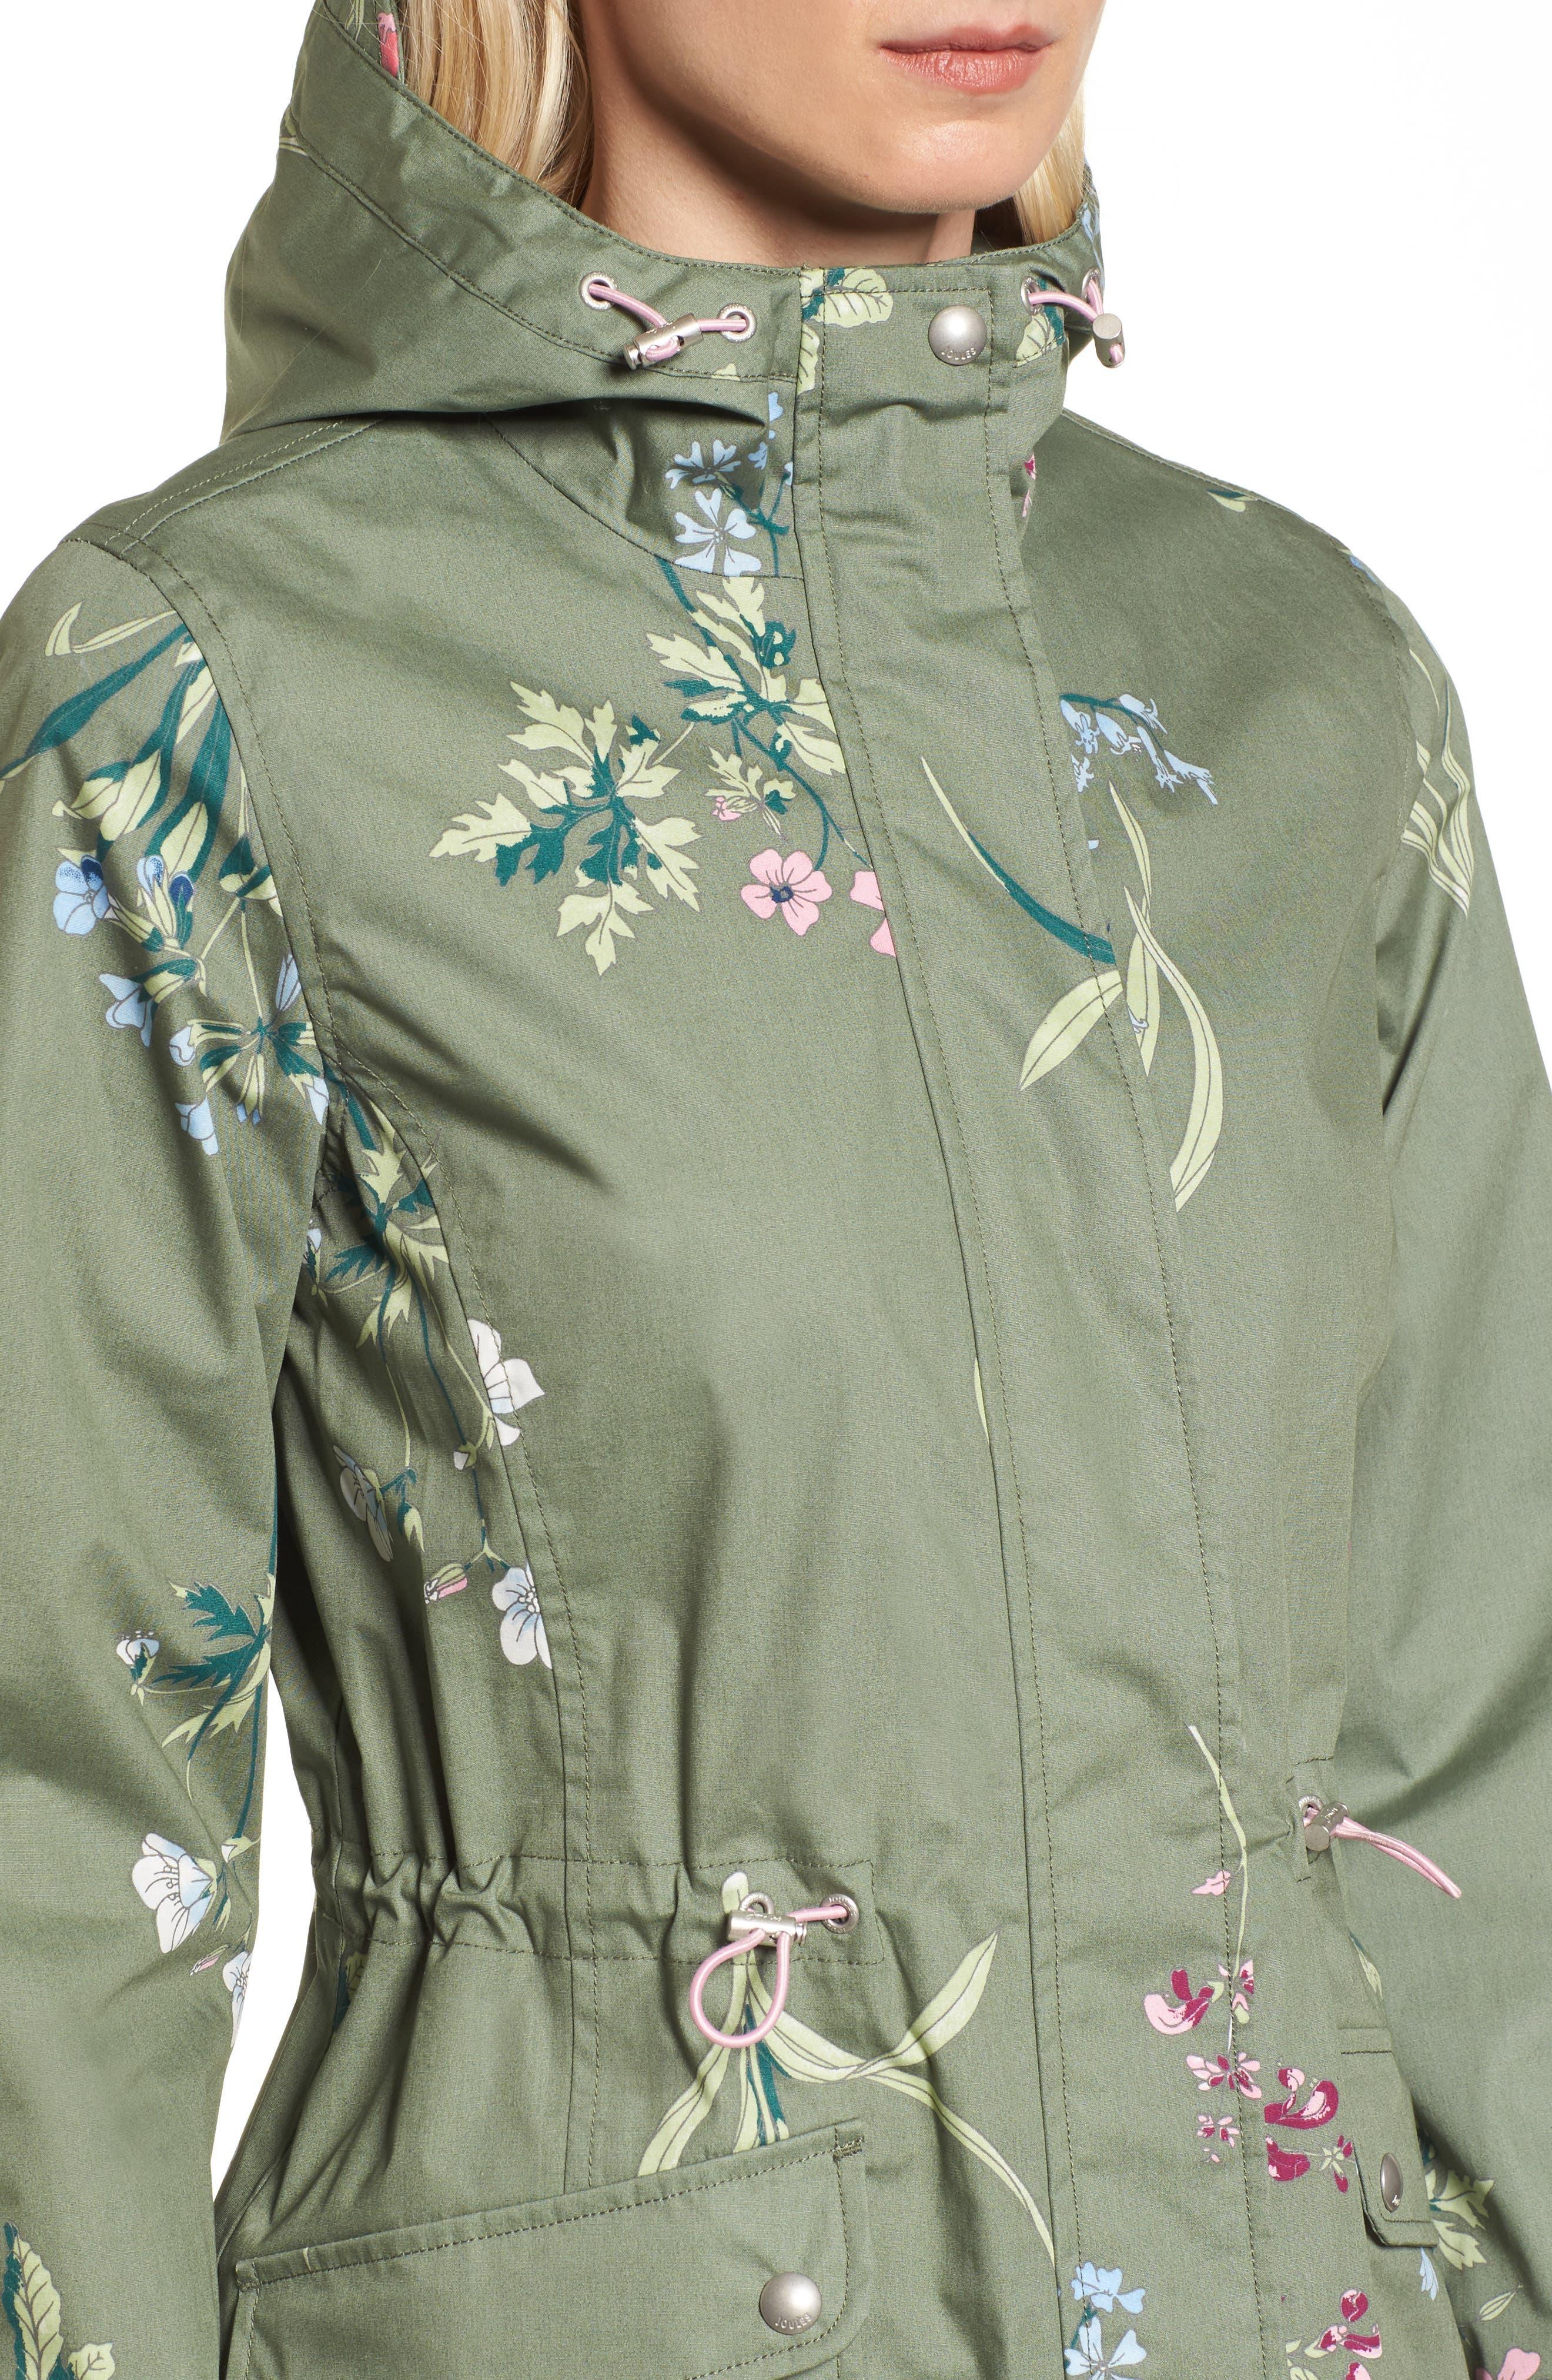 Right as Rain - Coastline Waterproof Cotton Jacket,                             Alternate thumbnail 4, color,